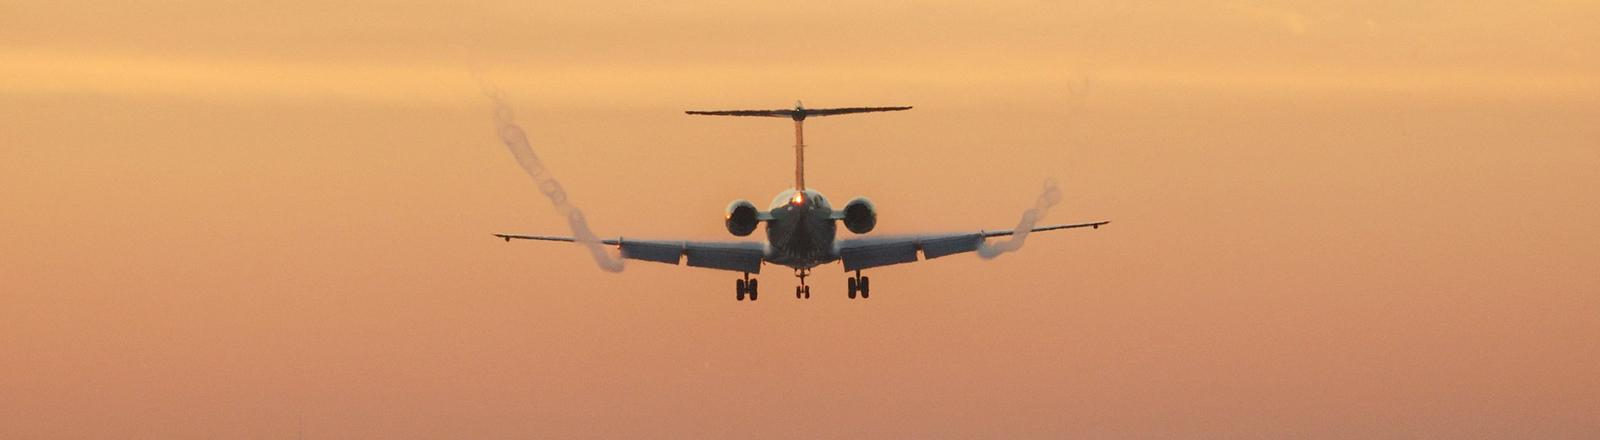 Flugzeug bei der Landung